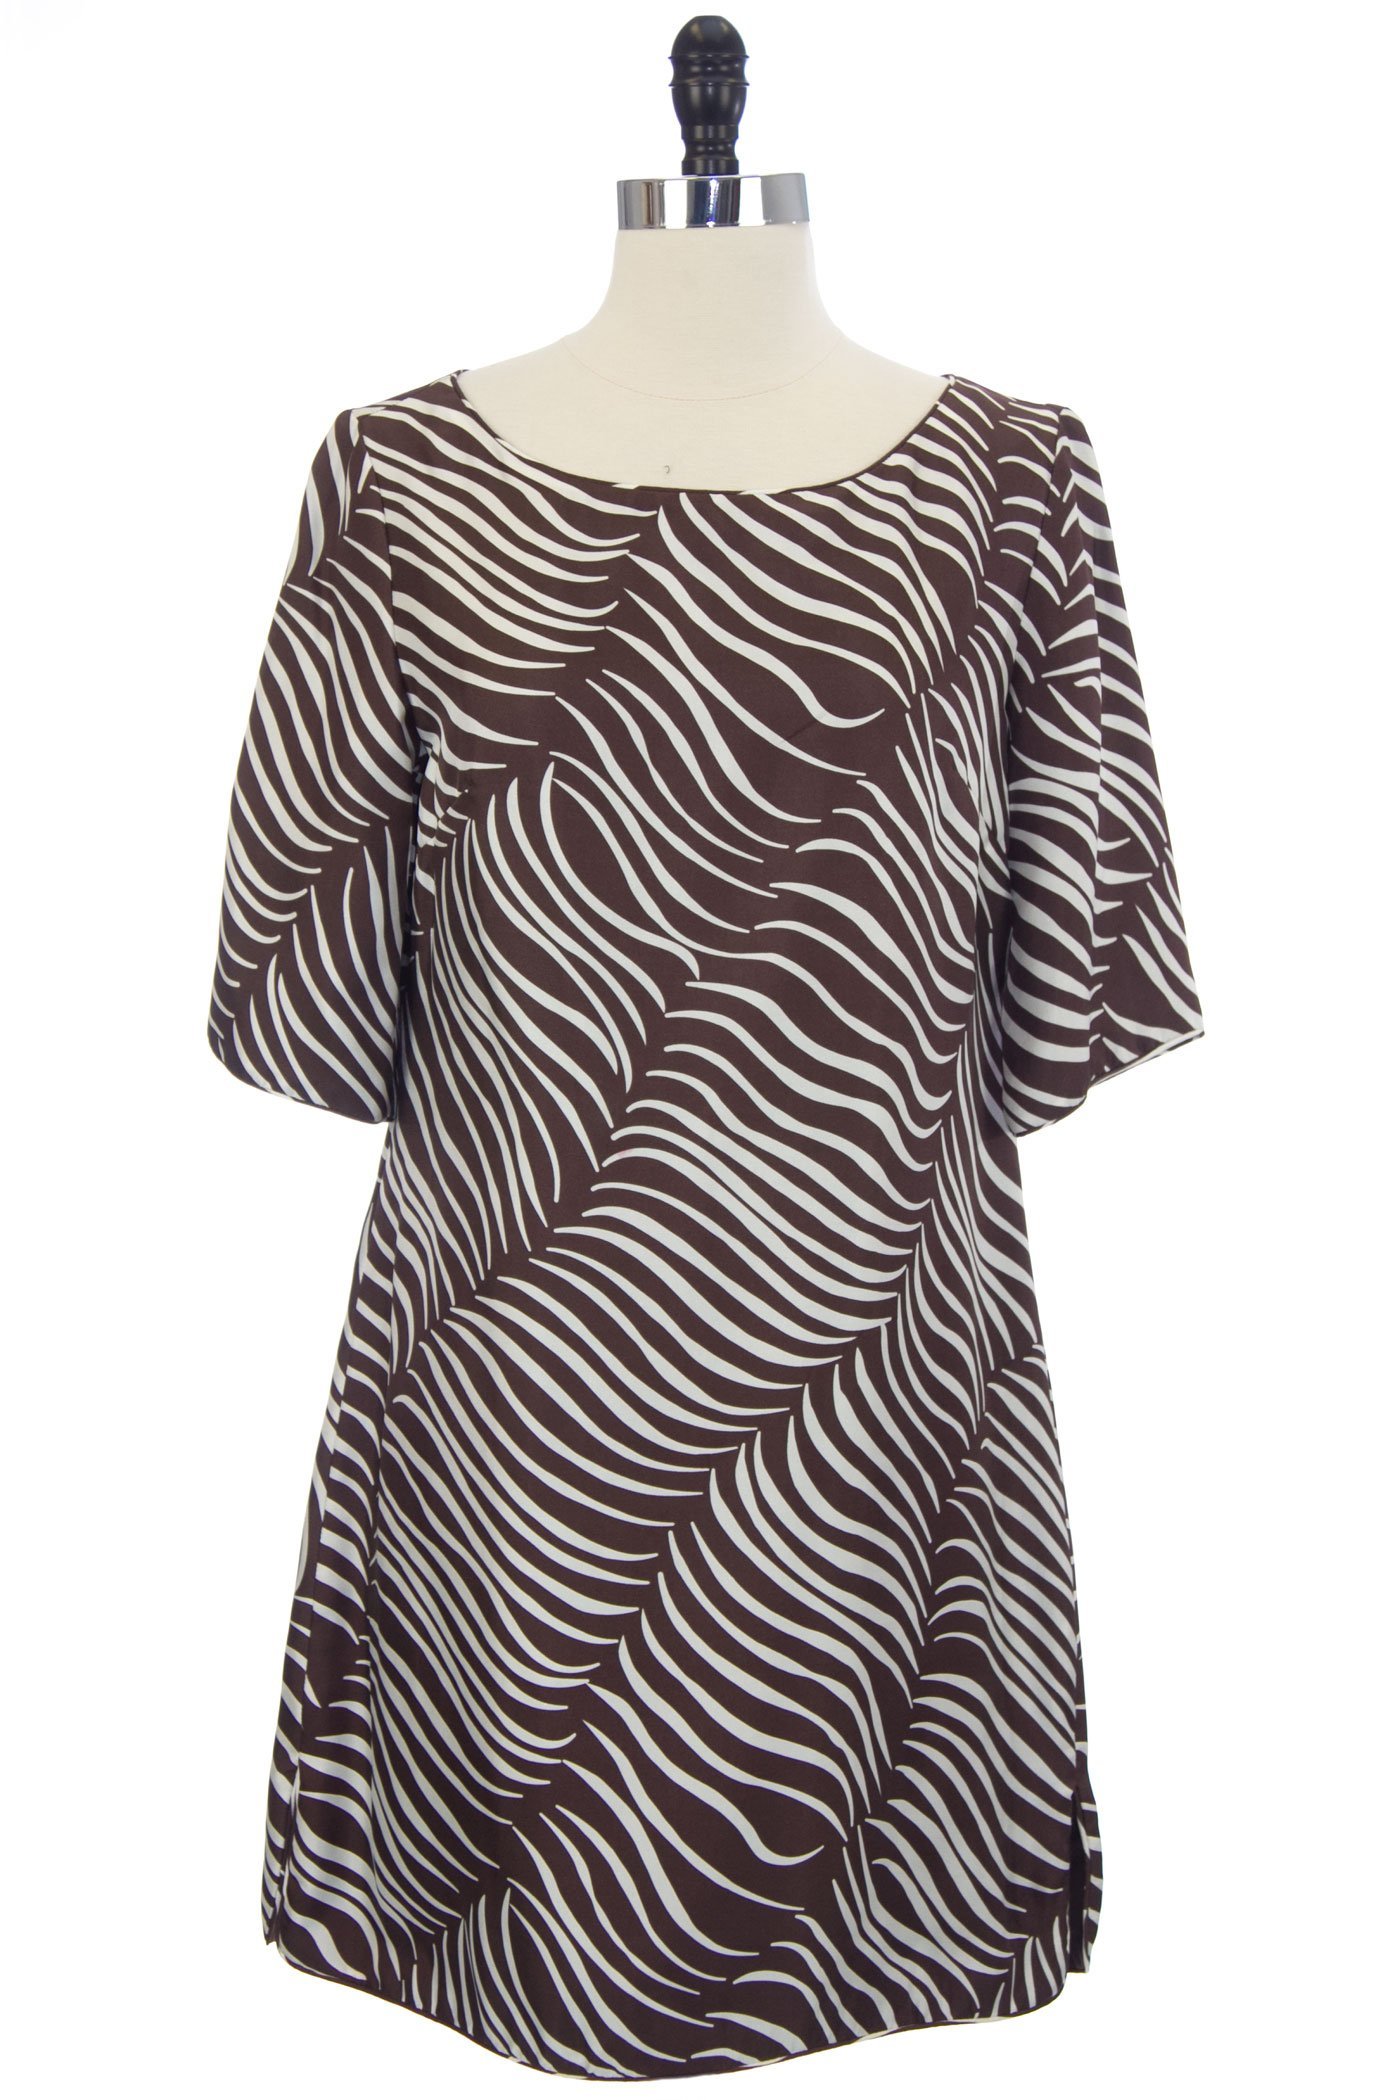 Elizabeth Mckay Women's Cropped Sleeve Lindsay Tunic Dress 4 Chocolate Multi